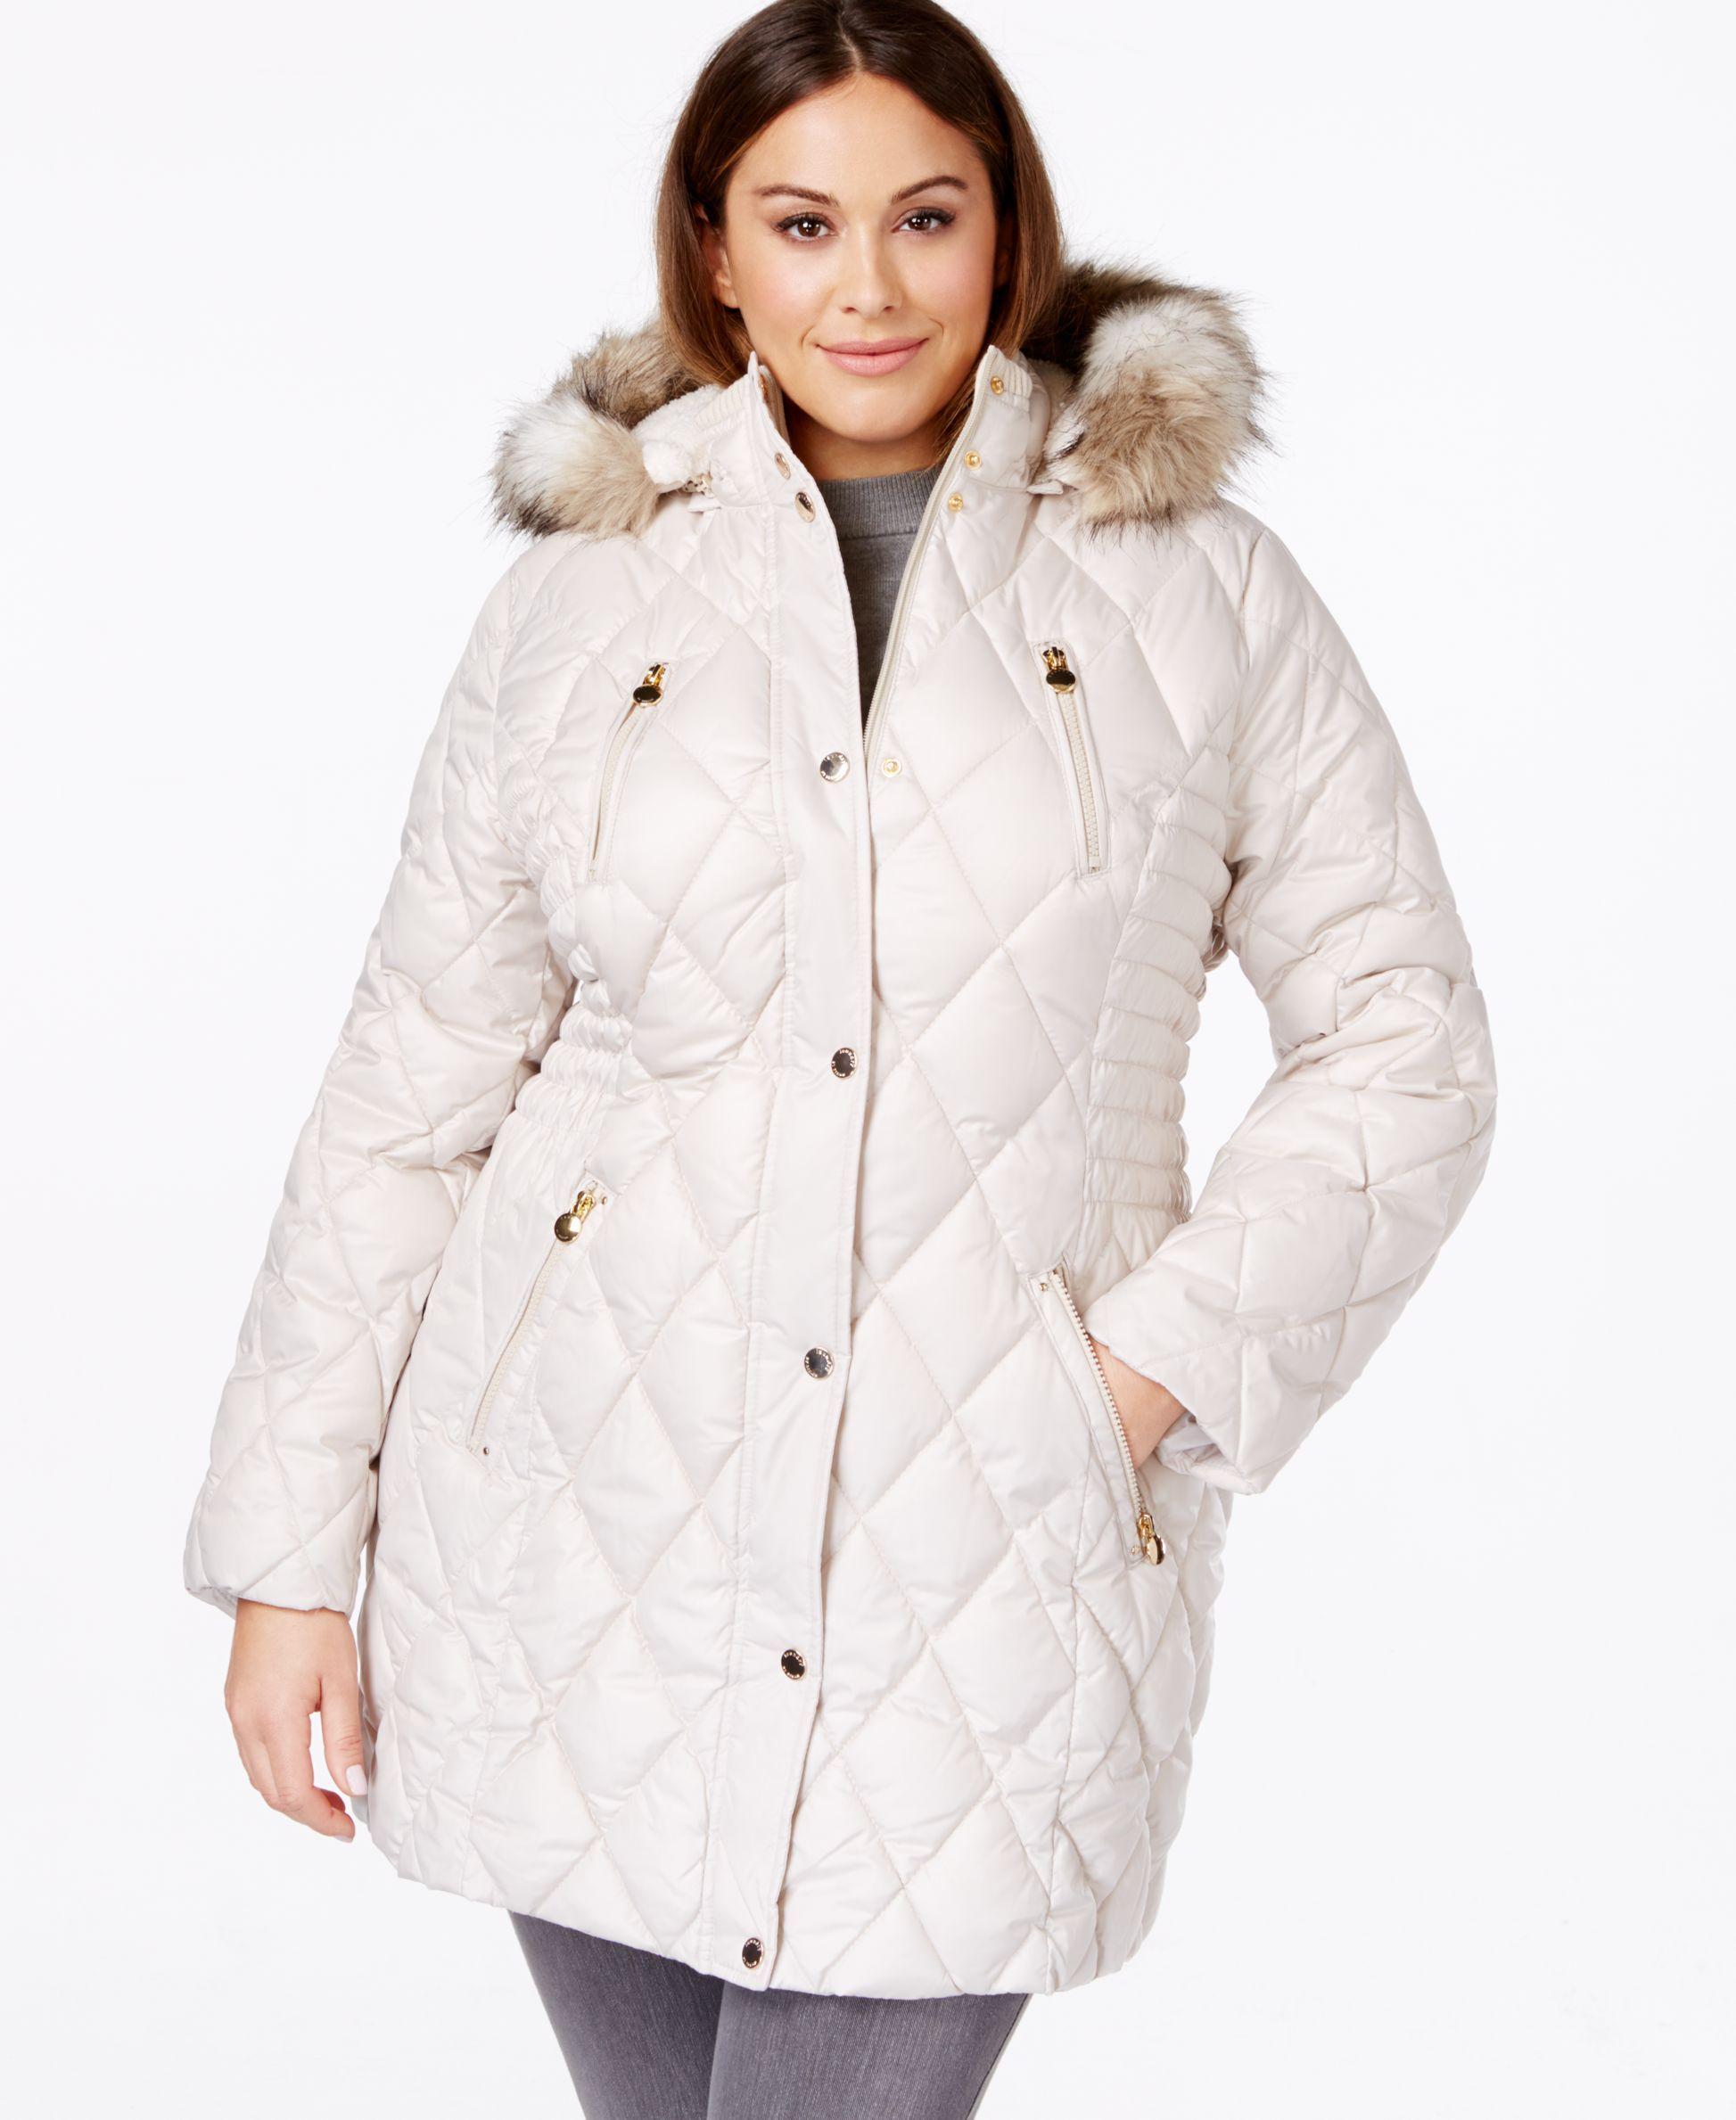 Laundry By Design Plus Size Faux Fur Trim Quilted Coat Quilted Coat Coat Online Coat